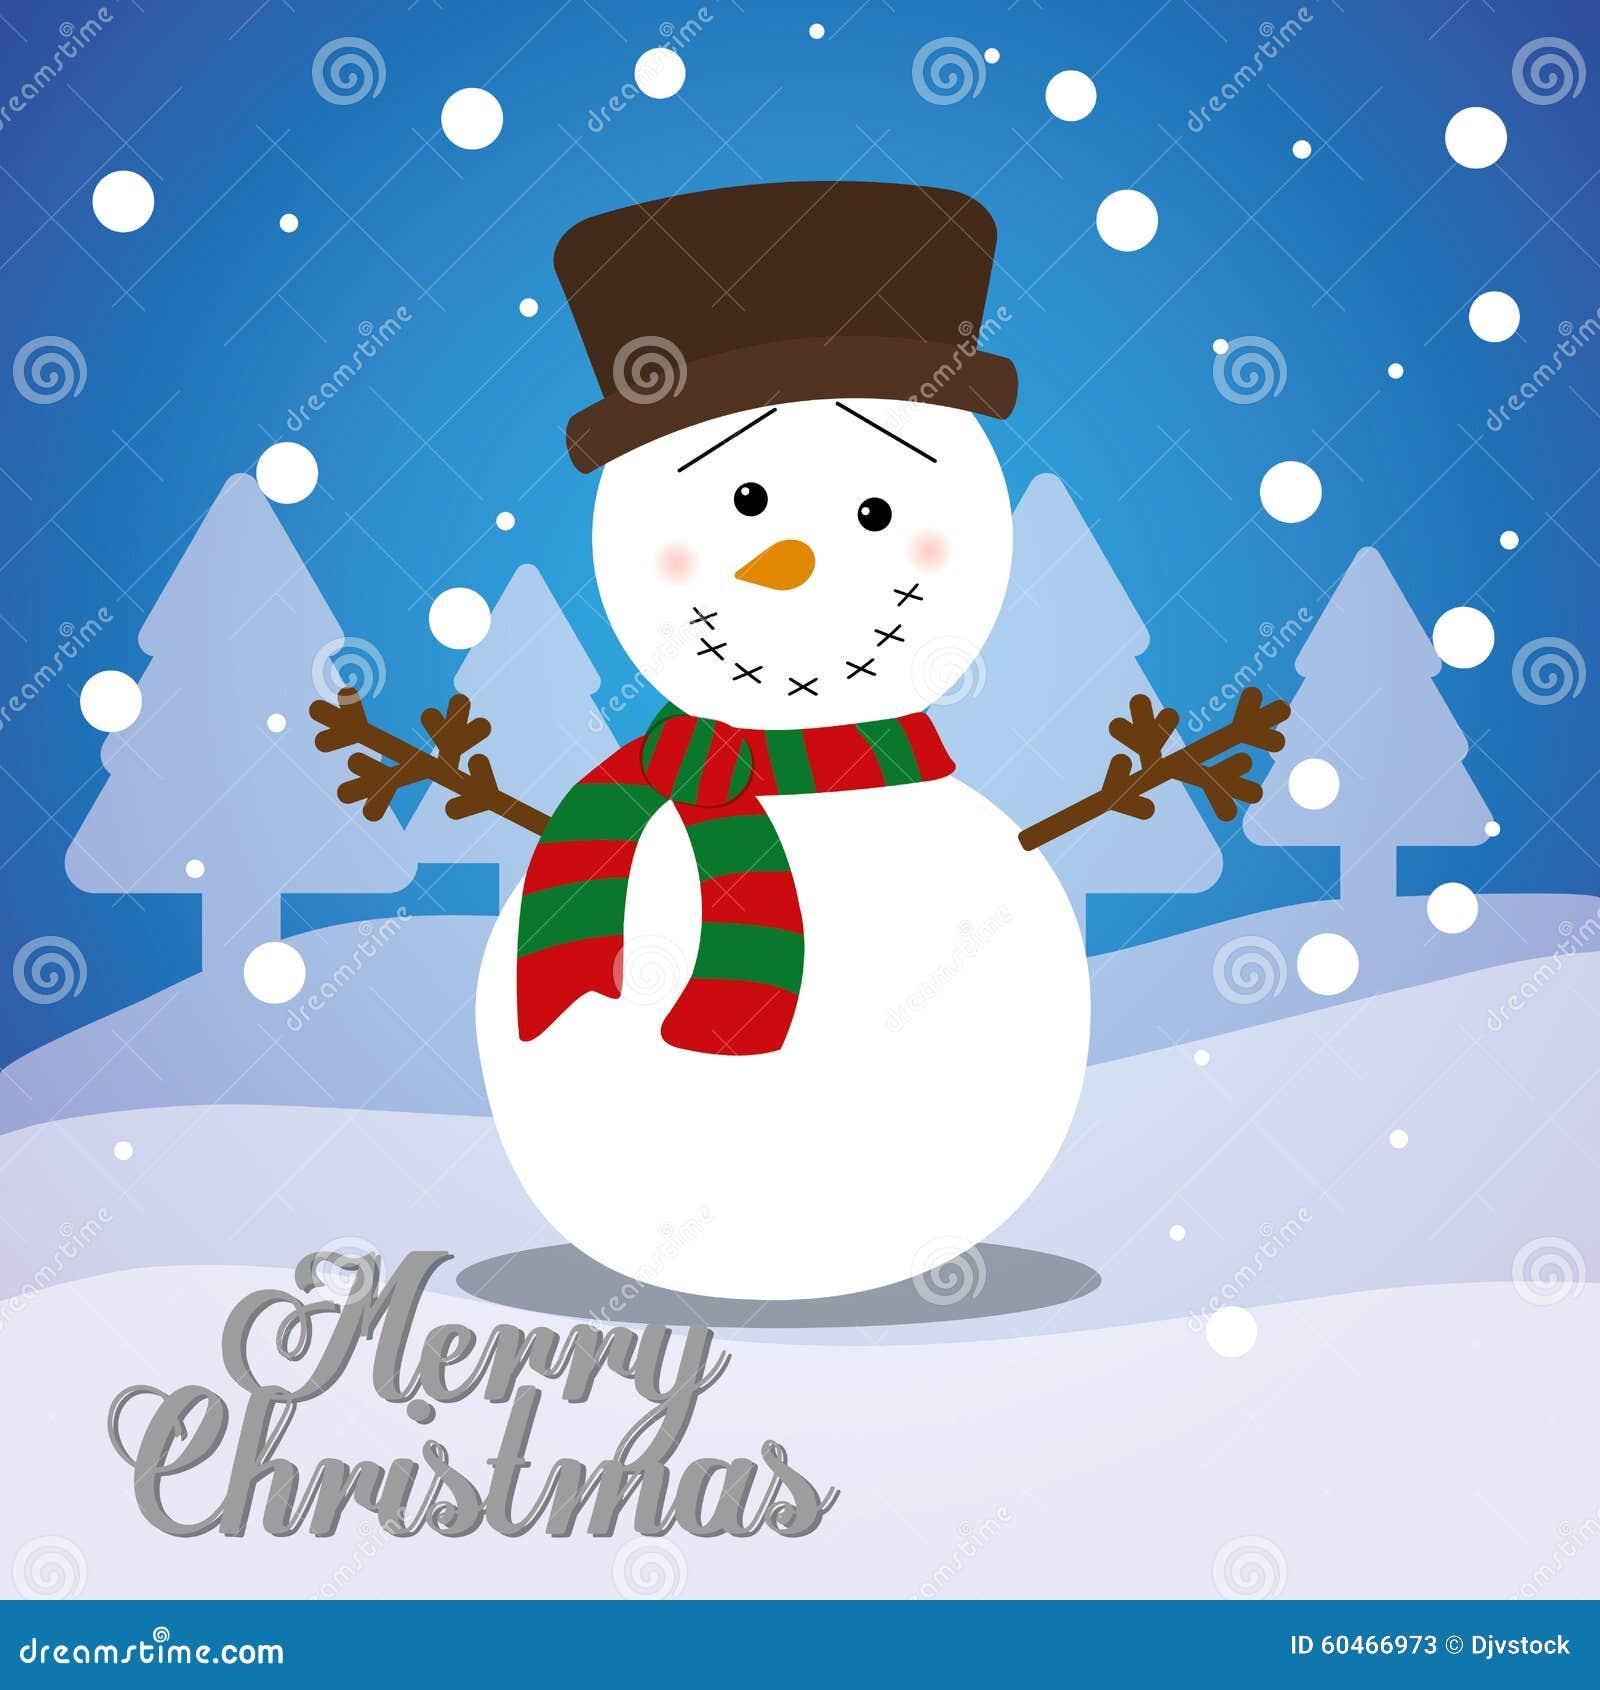 Merry Christmas Card Design Stock Vector - Illustration of snowman ...